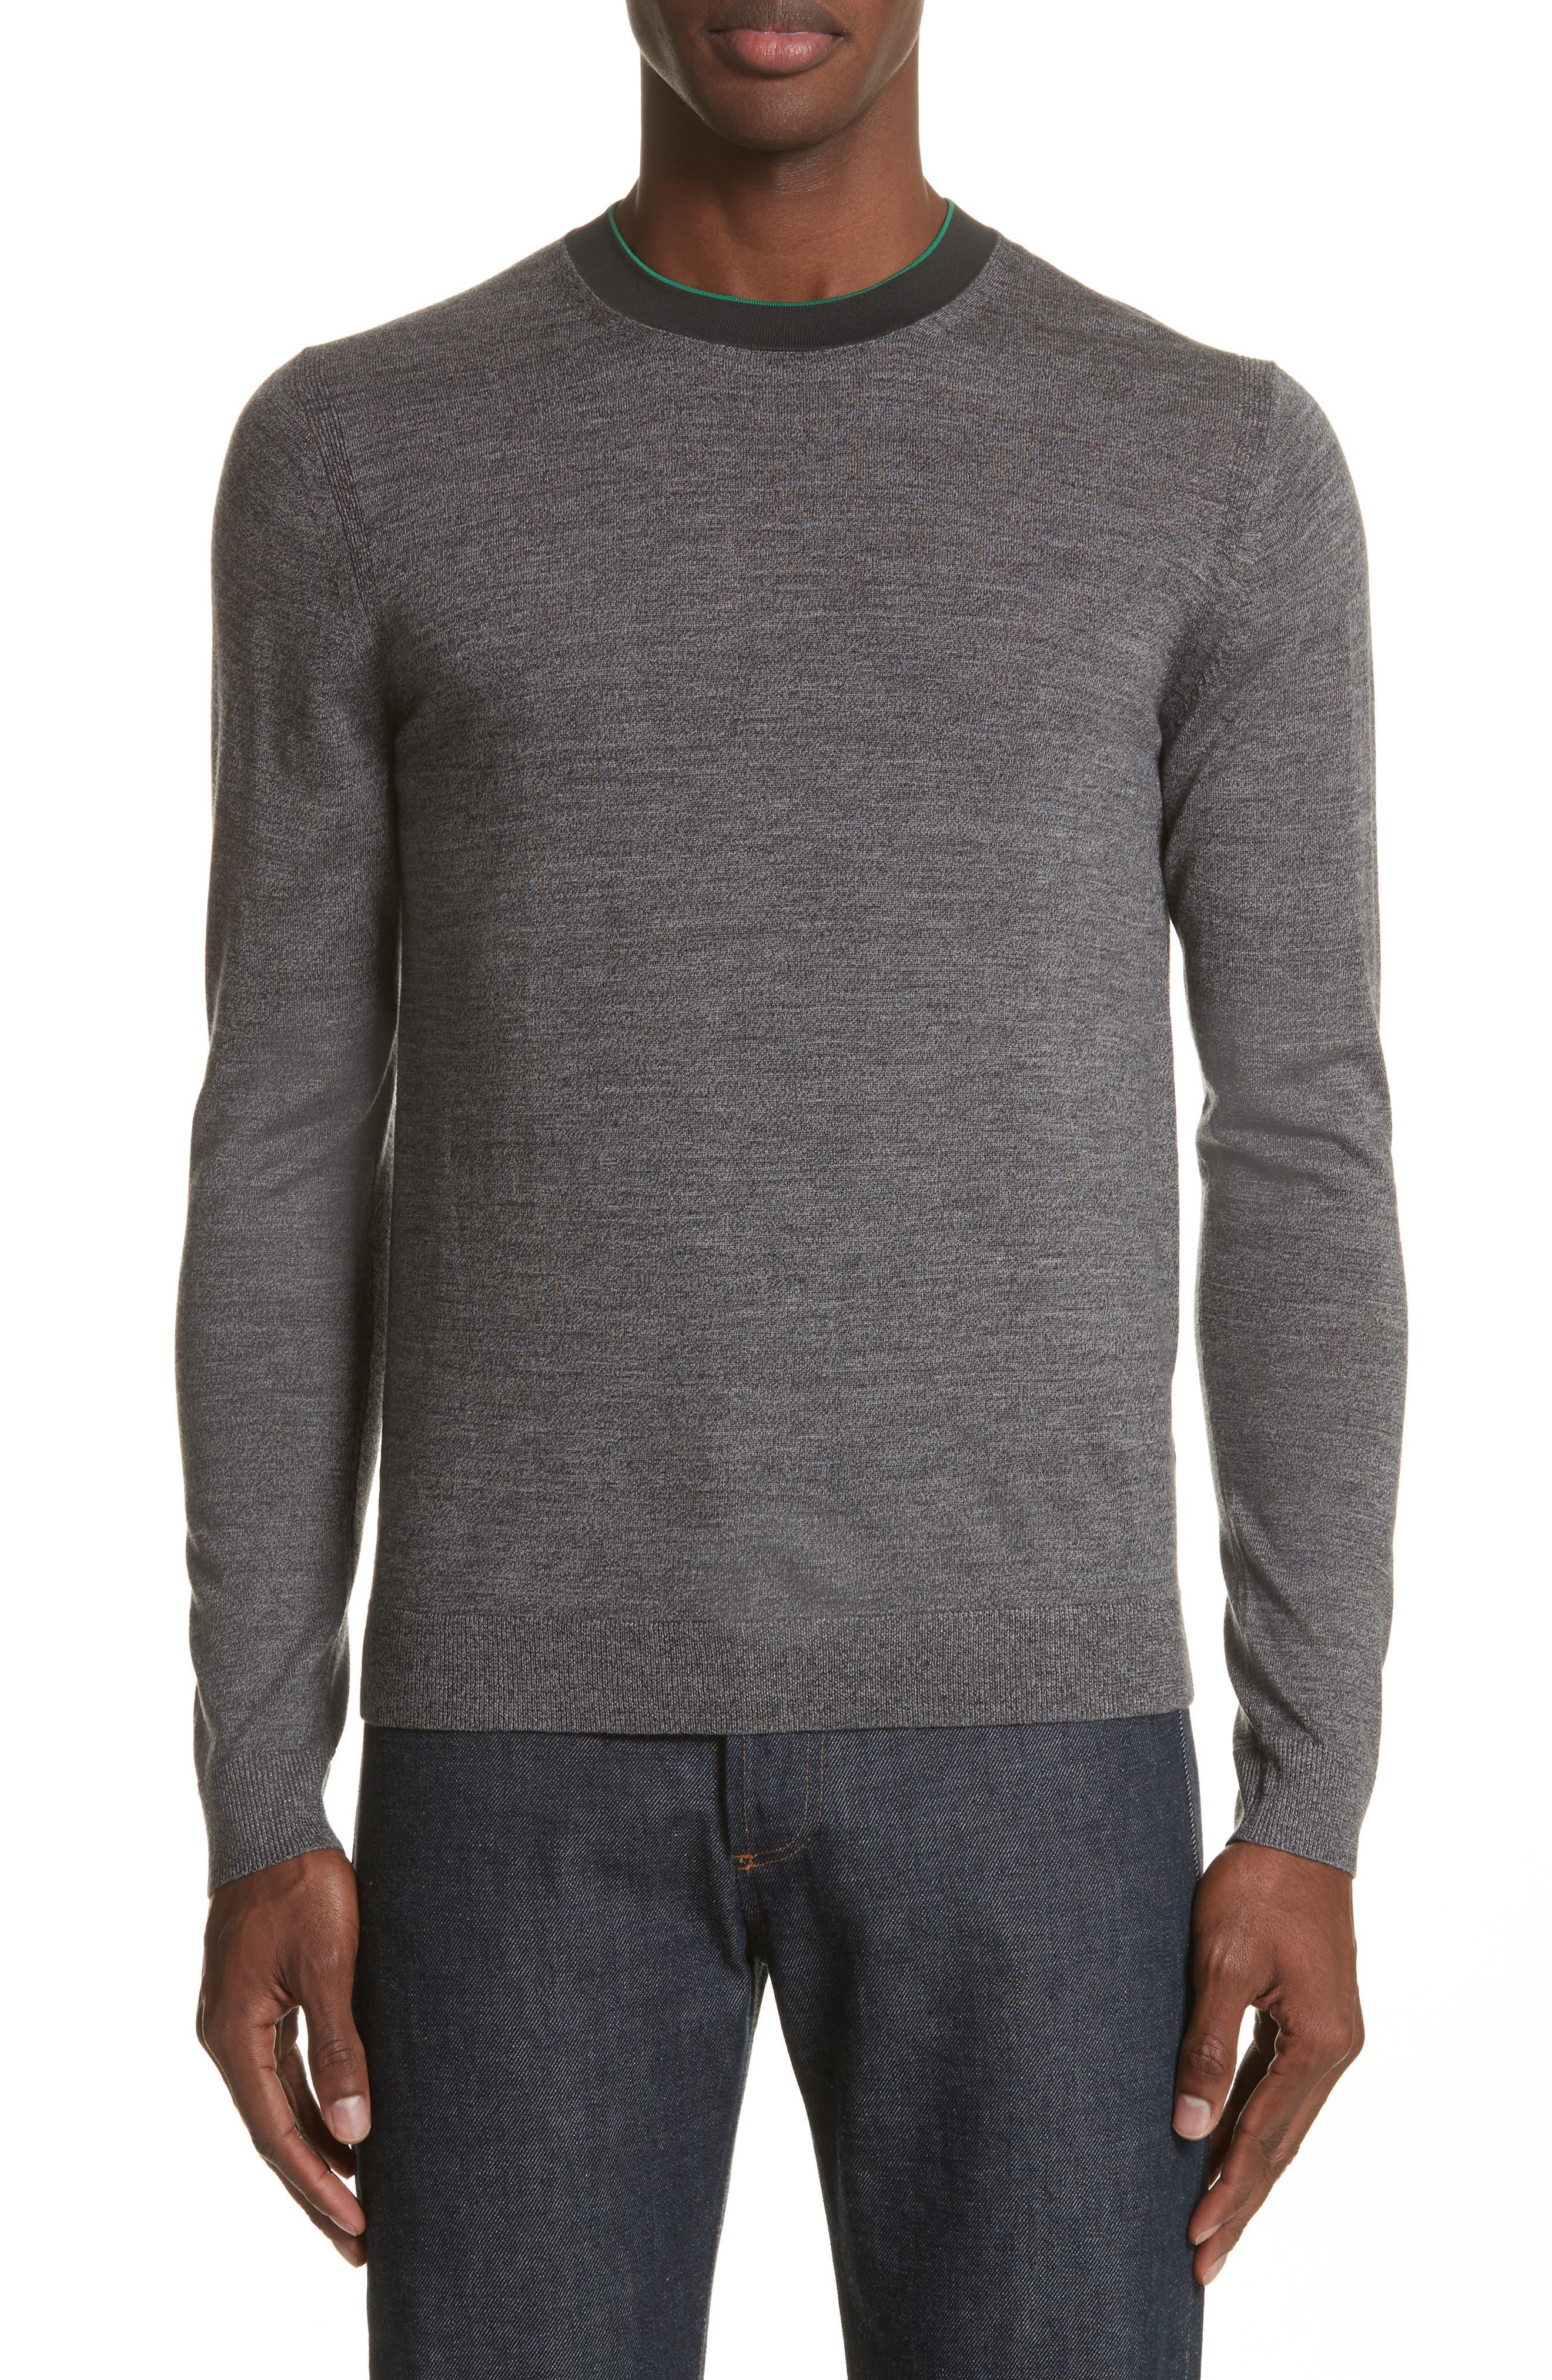 Crewneck Merino Wool Blend Sweater,                             Main thumbnail 1, color,                             Grey